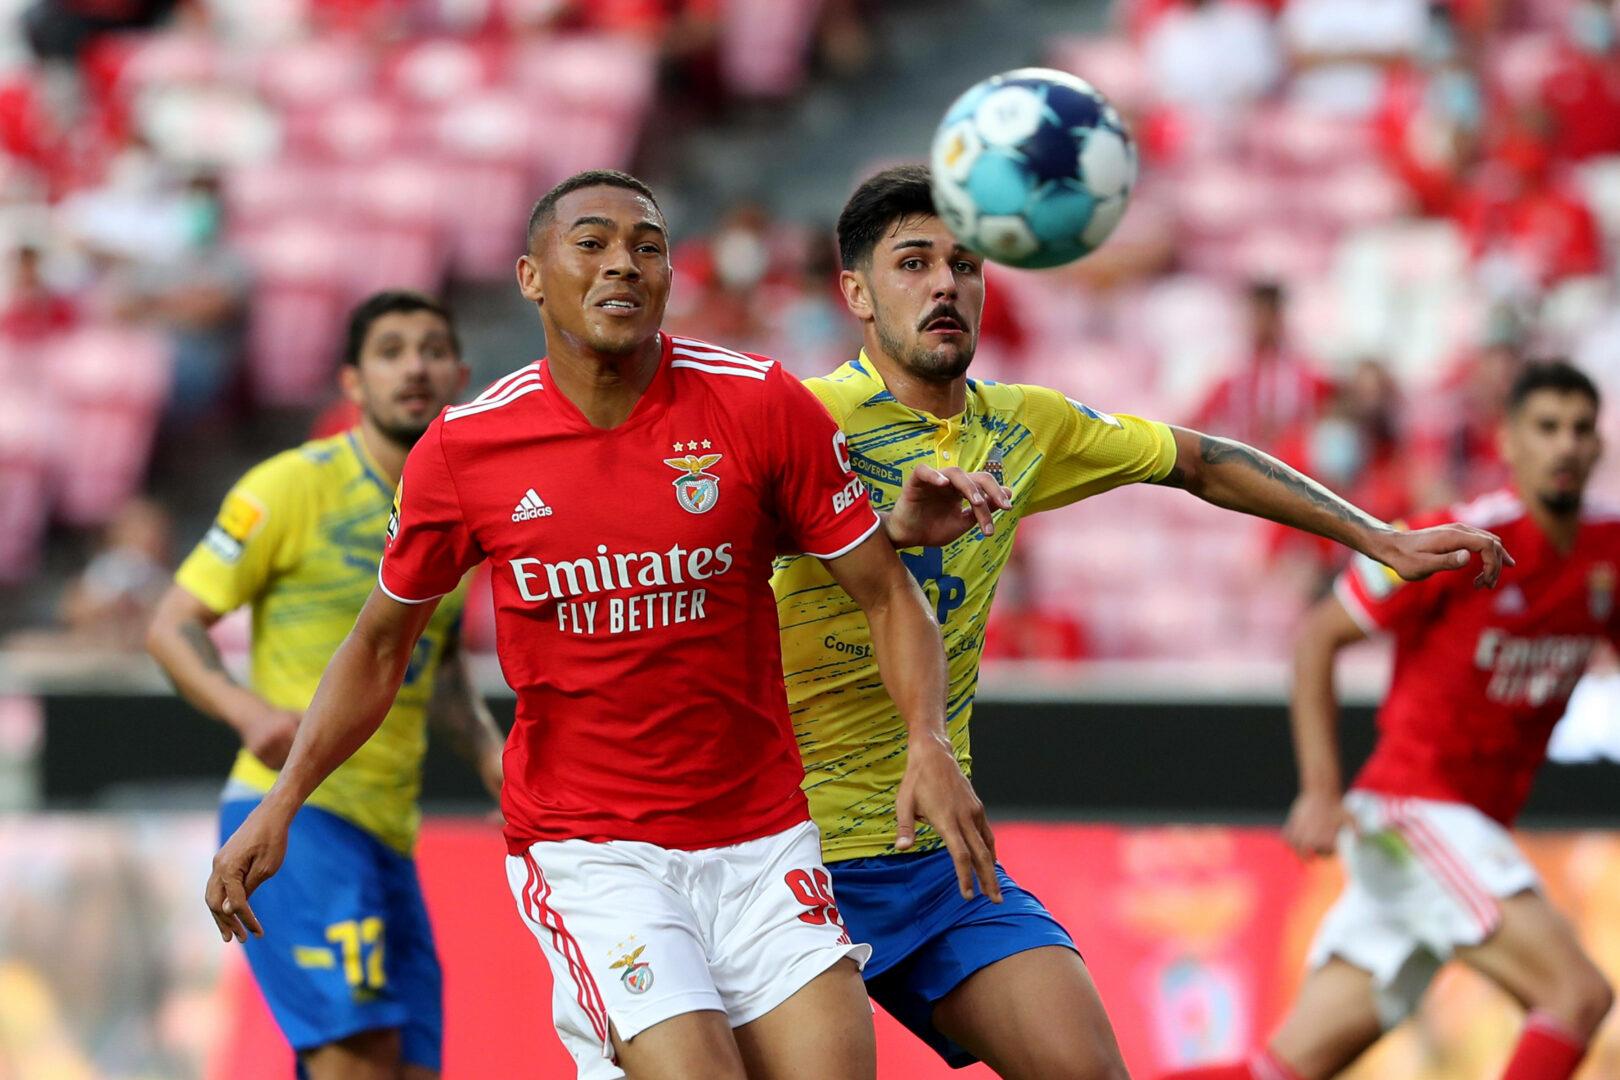 Carlos Vinicius von Benfica visiert den Ball an